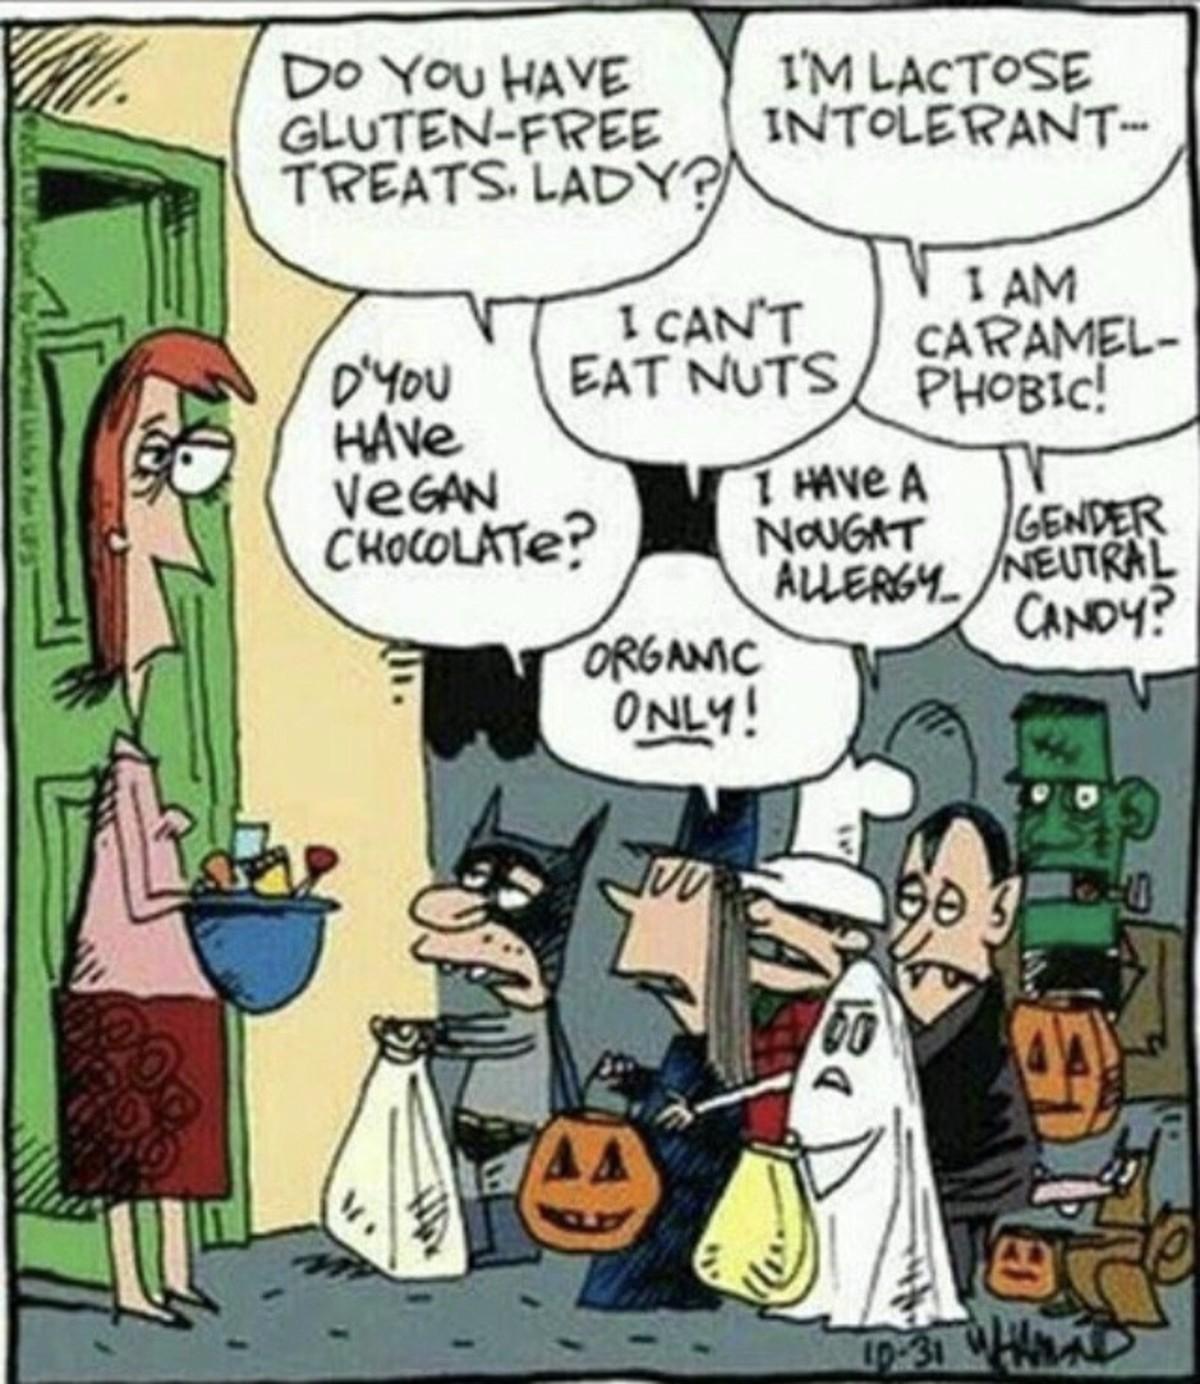 Tumblr on Halloween. .. >halloween is cancelled Ayy lmao I actua